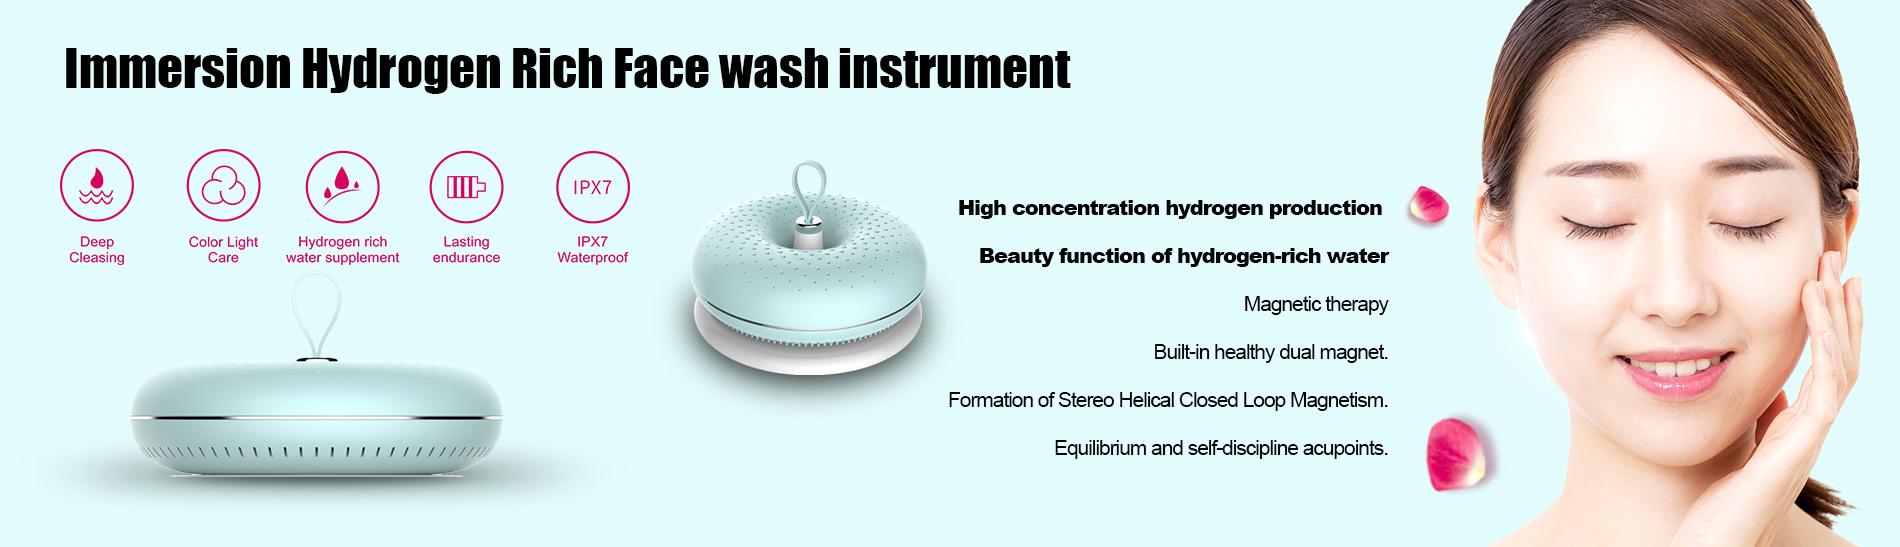 olansi beauty instrument manufacturer 6